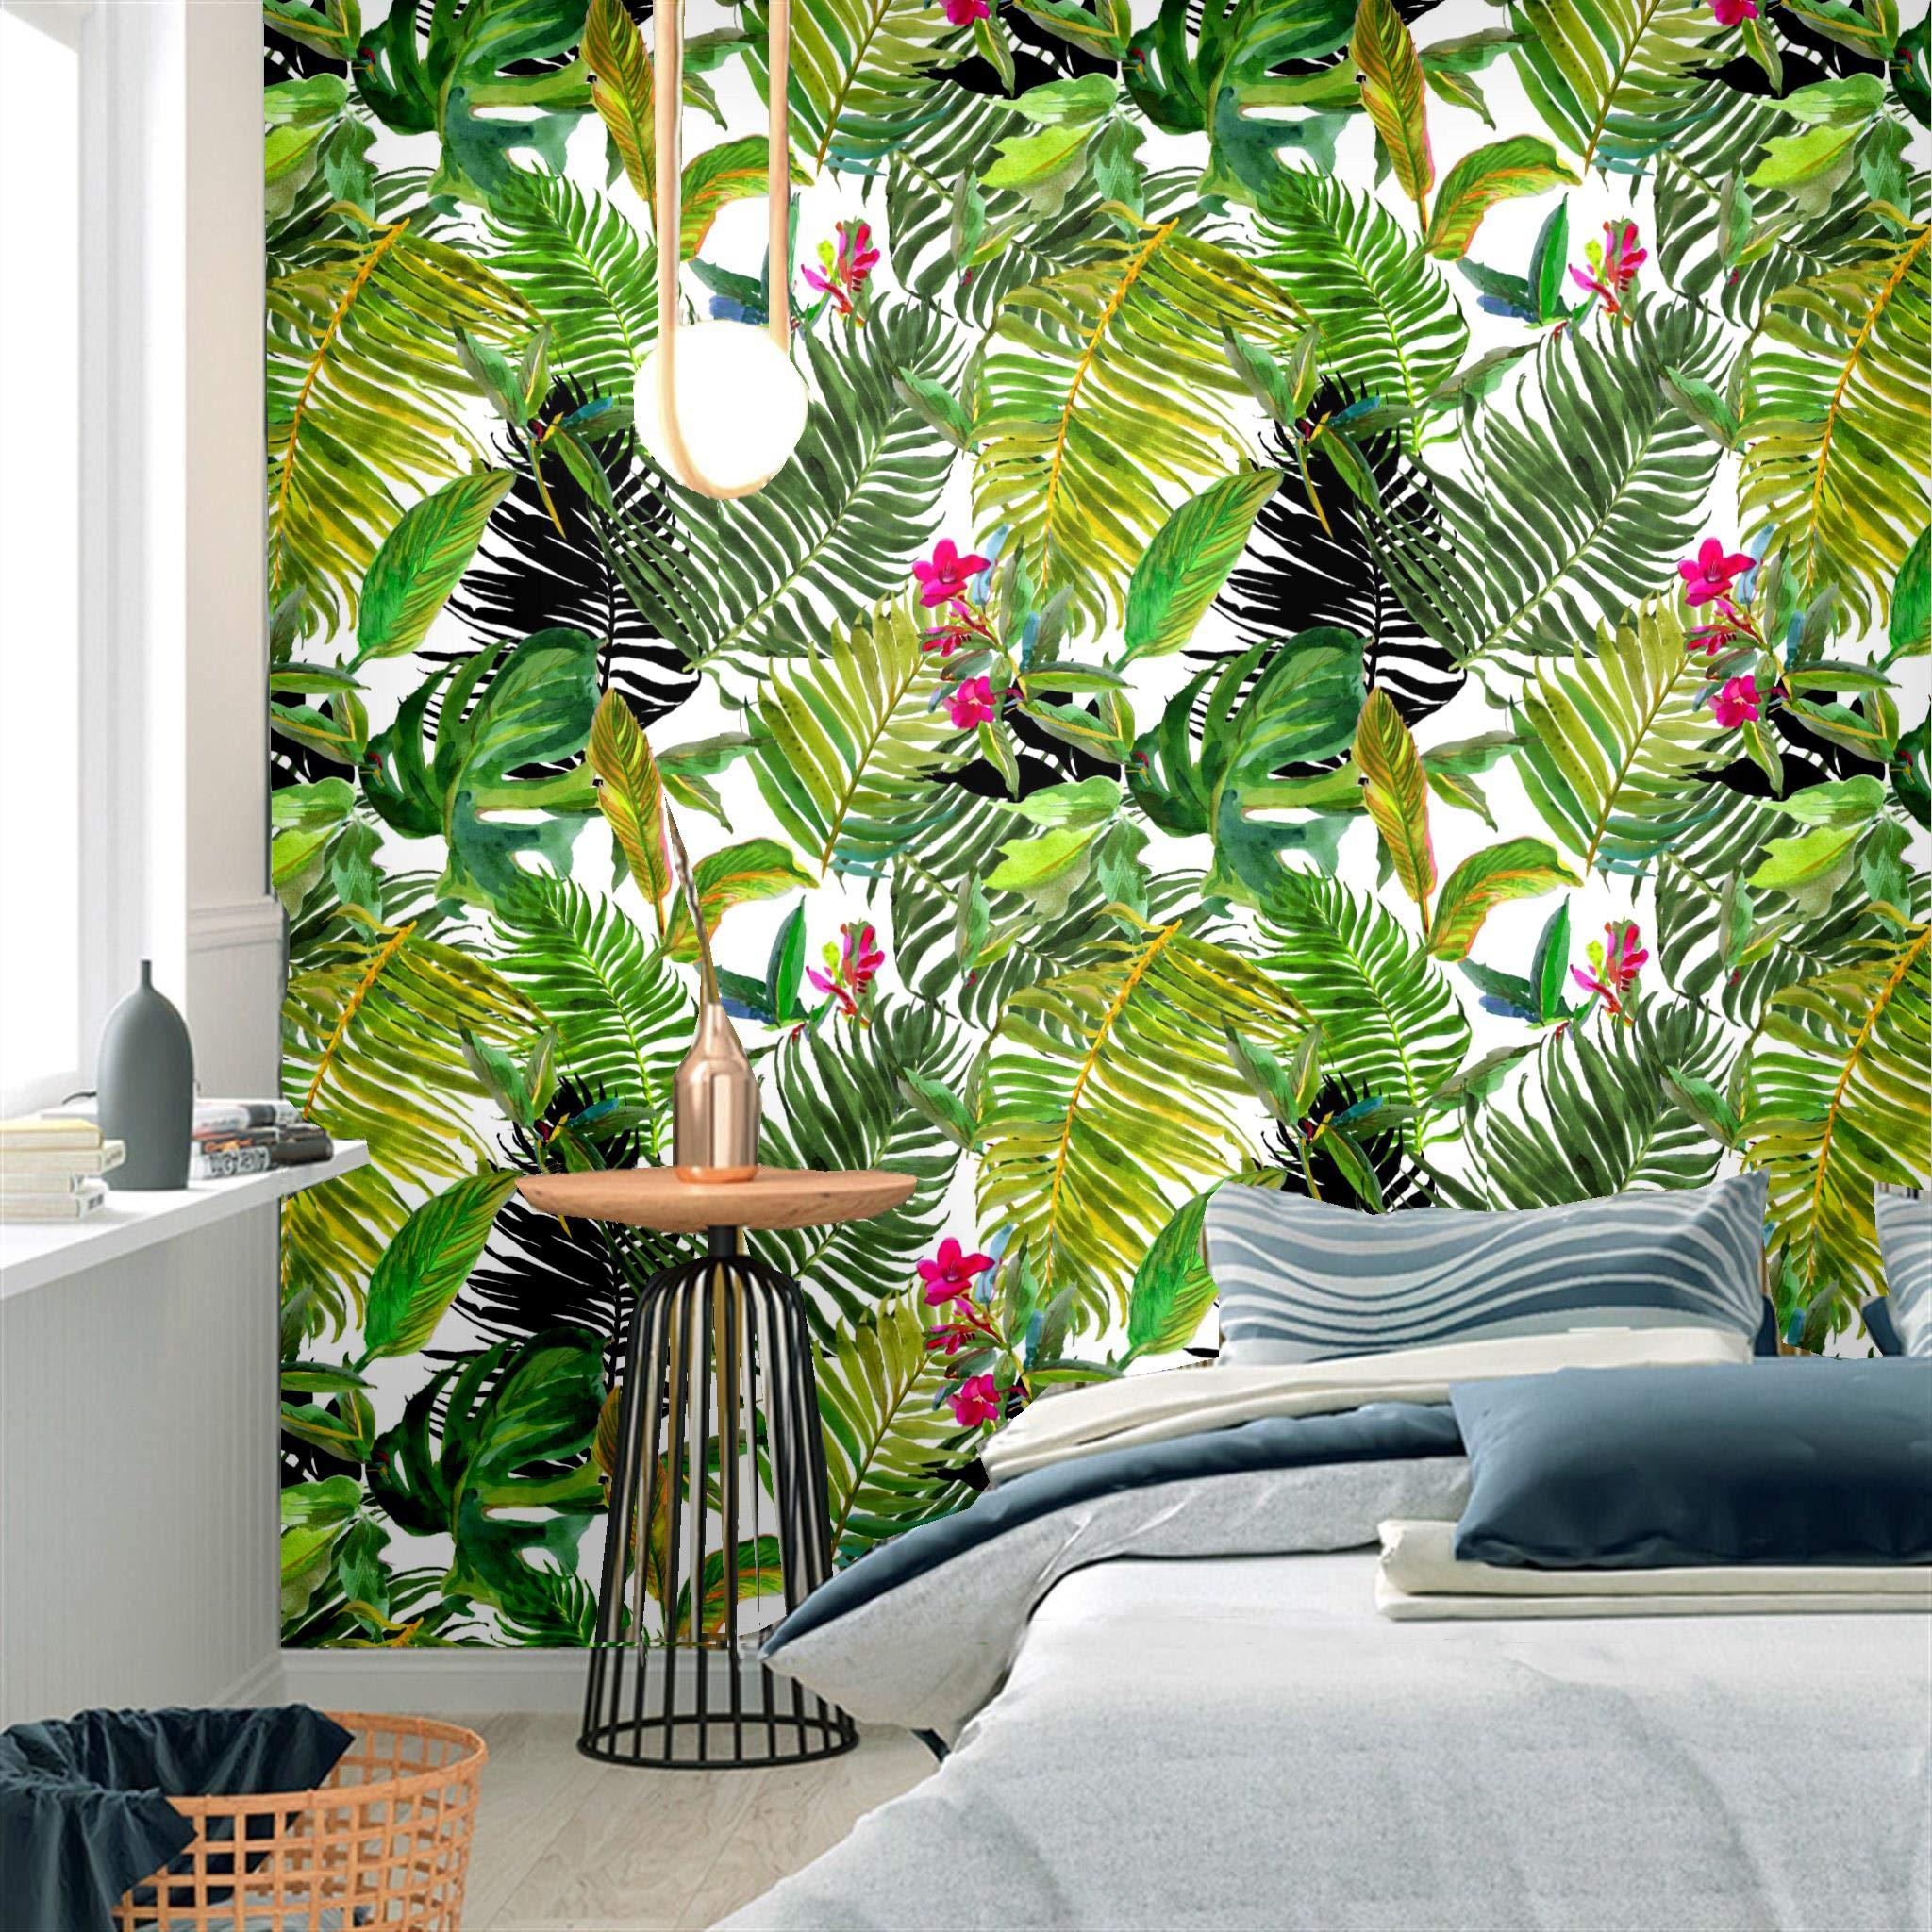 Tropical Palm Leaf Self-Adhesive Prepasted Wallpaper